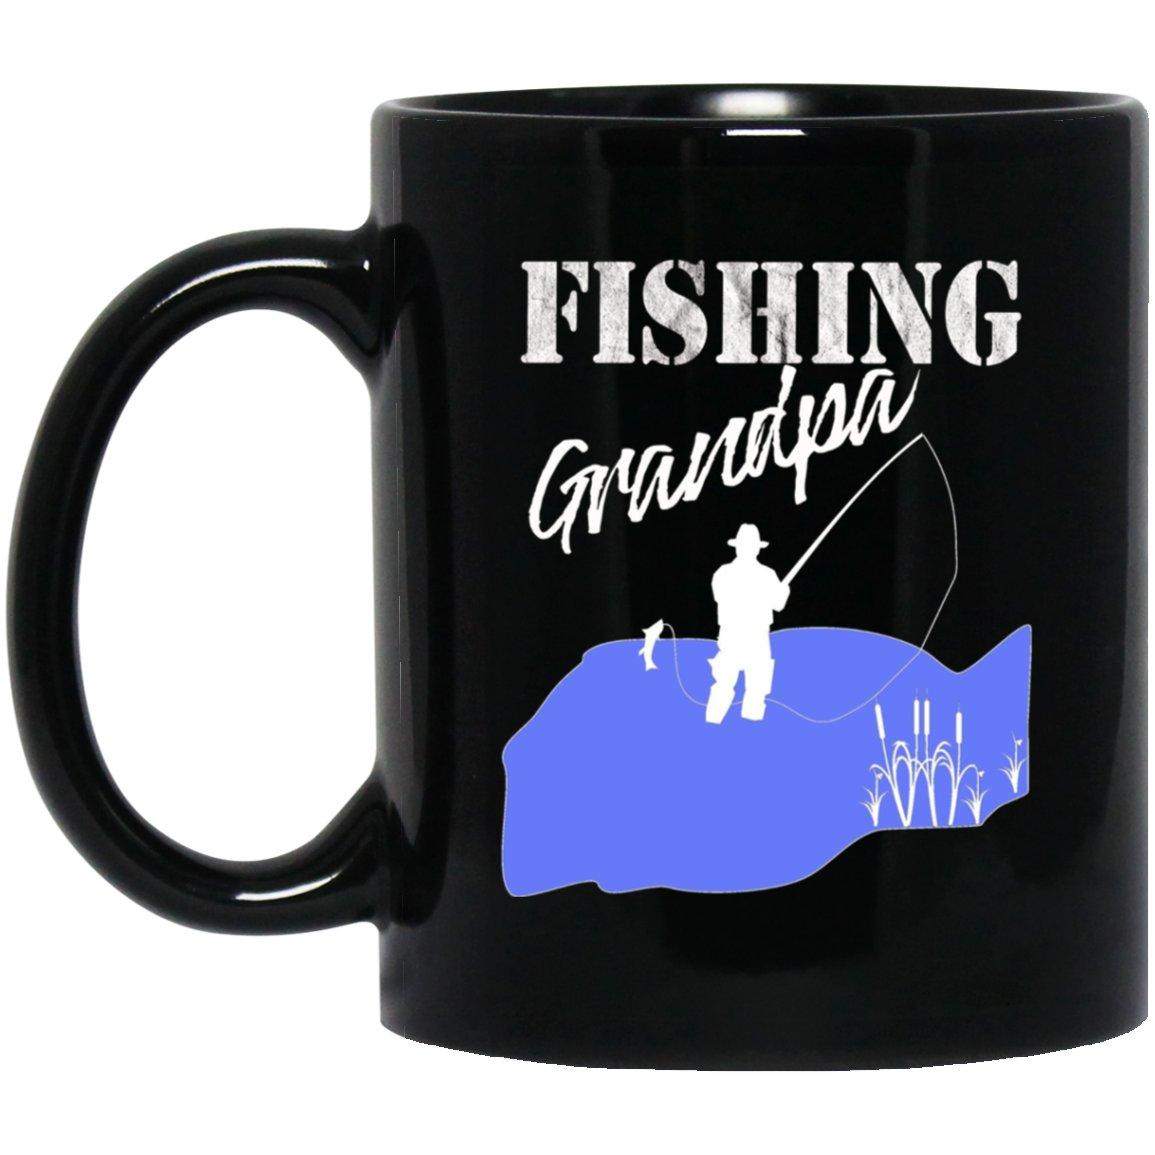 Mens Fishing Grandpa Fisherman Grandfather Gift Black  Mug Black Ceramic 11oz Coffee Tea Cup